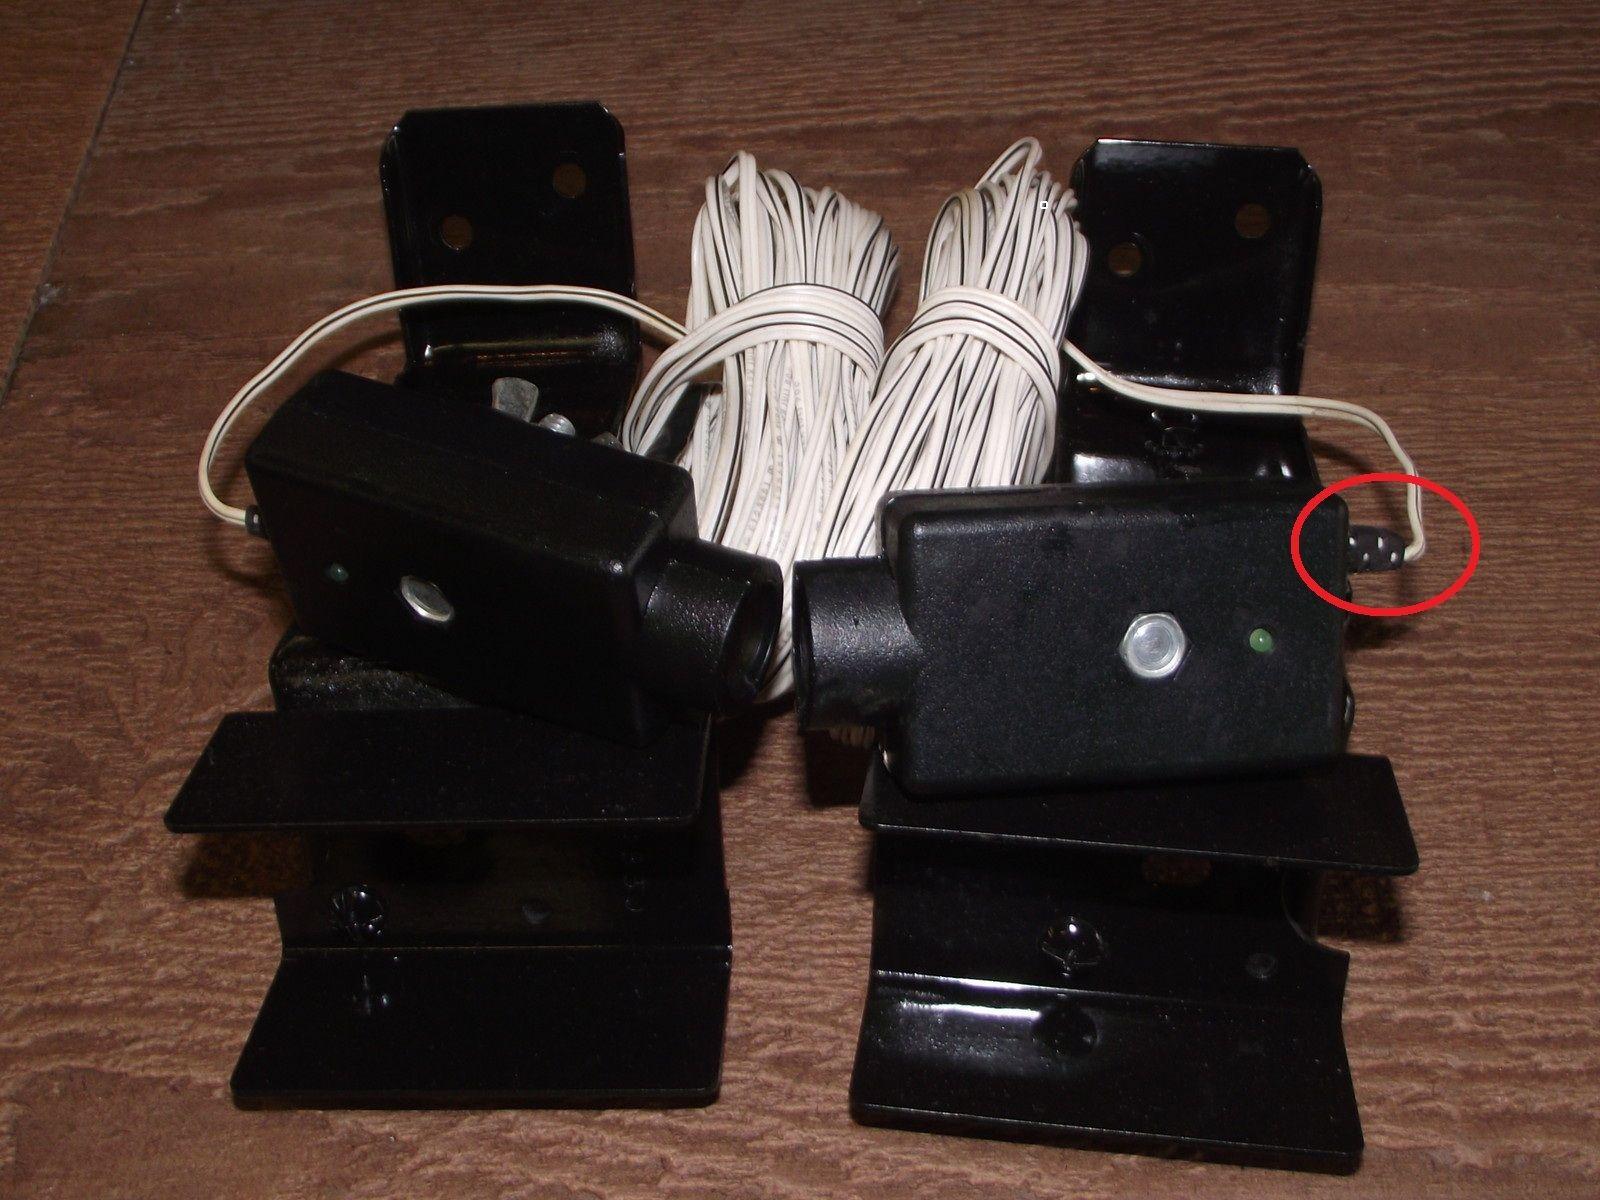 genie garage door opener photo eye safety sensors http voteno123 [ 1600 x 1200 Pixel ]